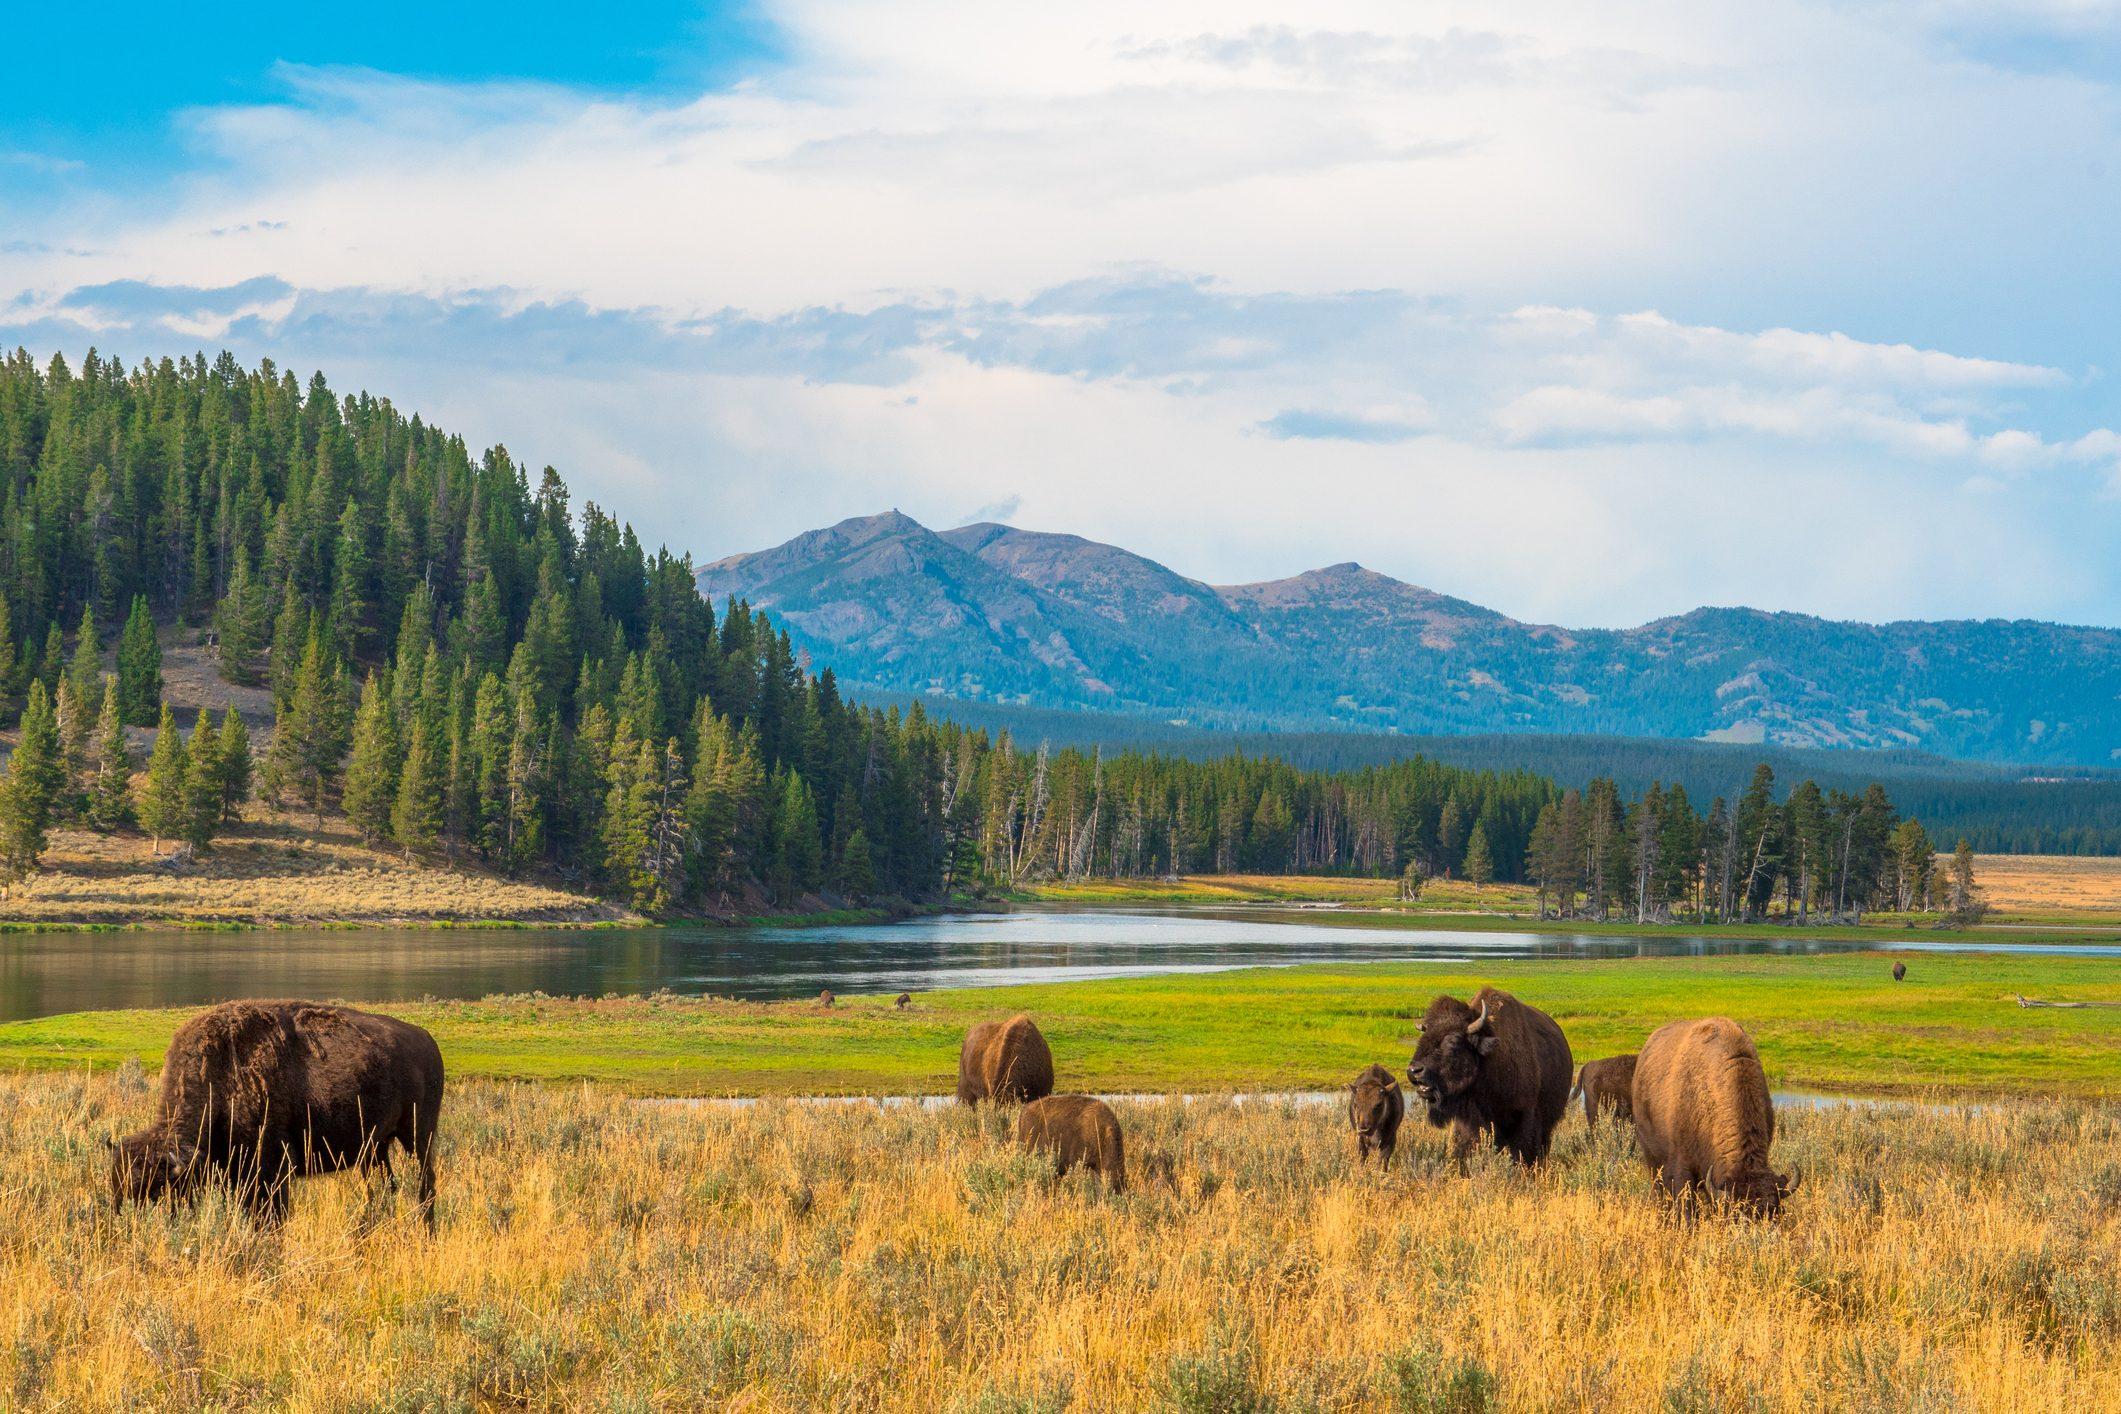 Buffalos grazing at Hayden Valley, Yellowstone, National Park, Wyoming, USA